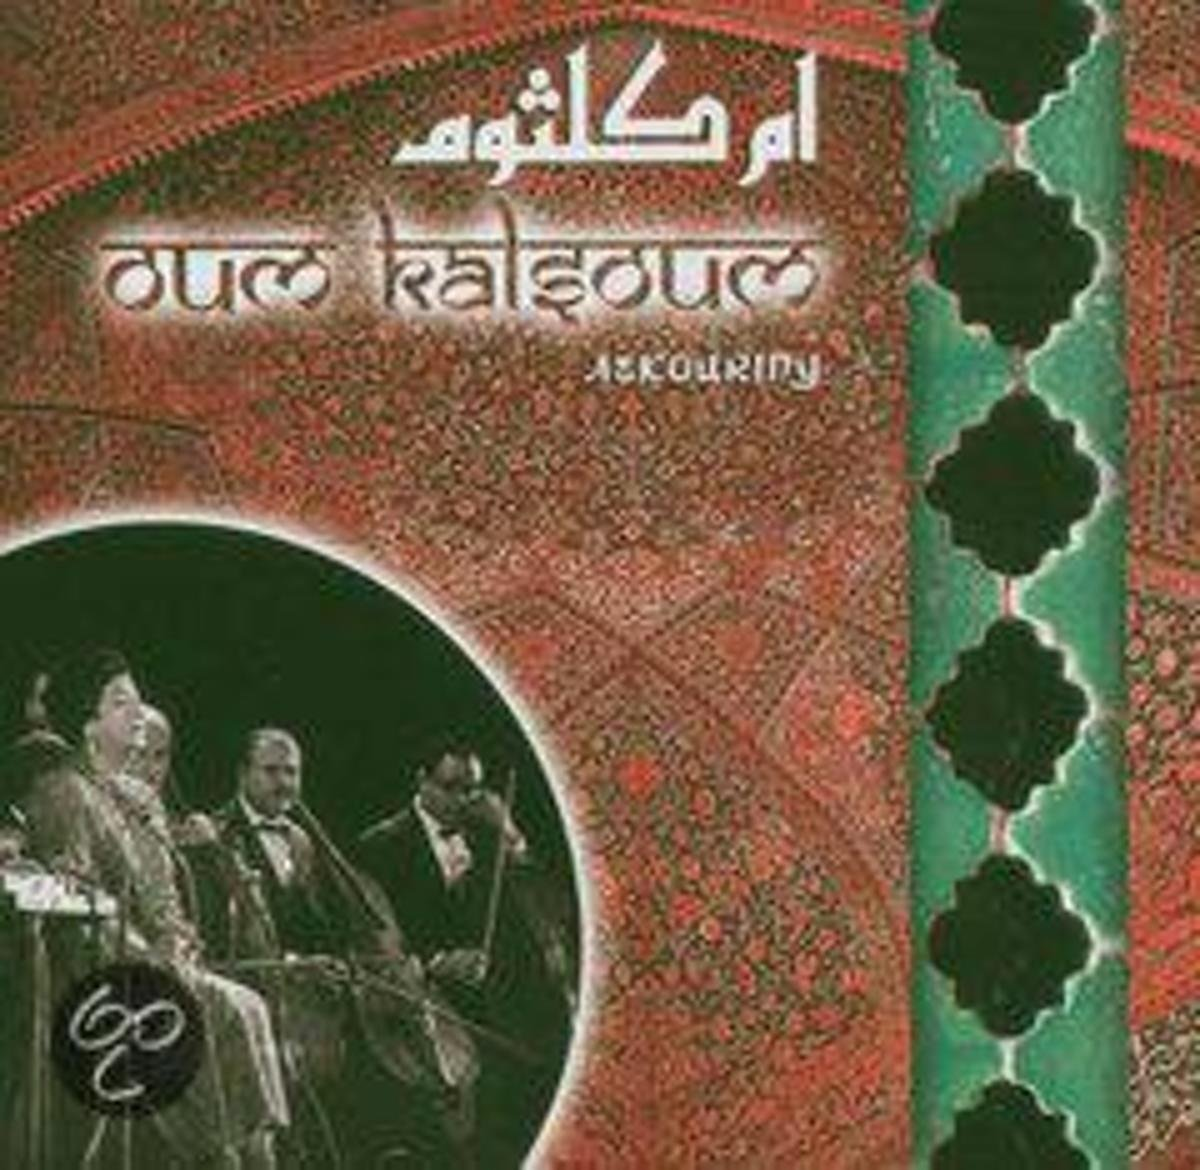 Oum Kalsoum: Azkouriny MW00039541  Music & Words World Music CD  Muziek Egypte